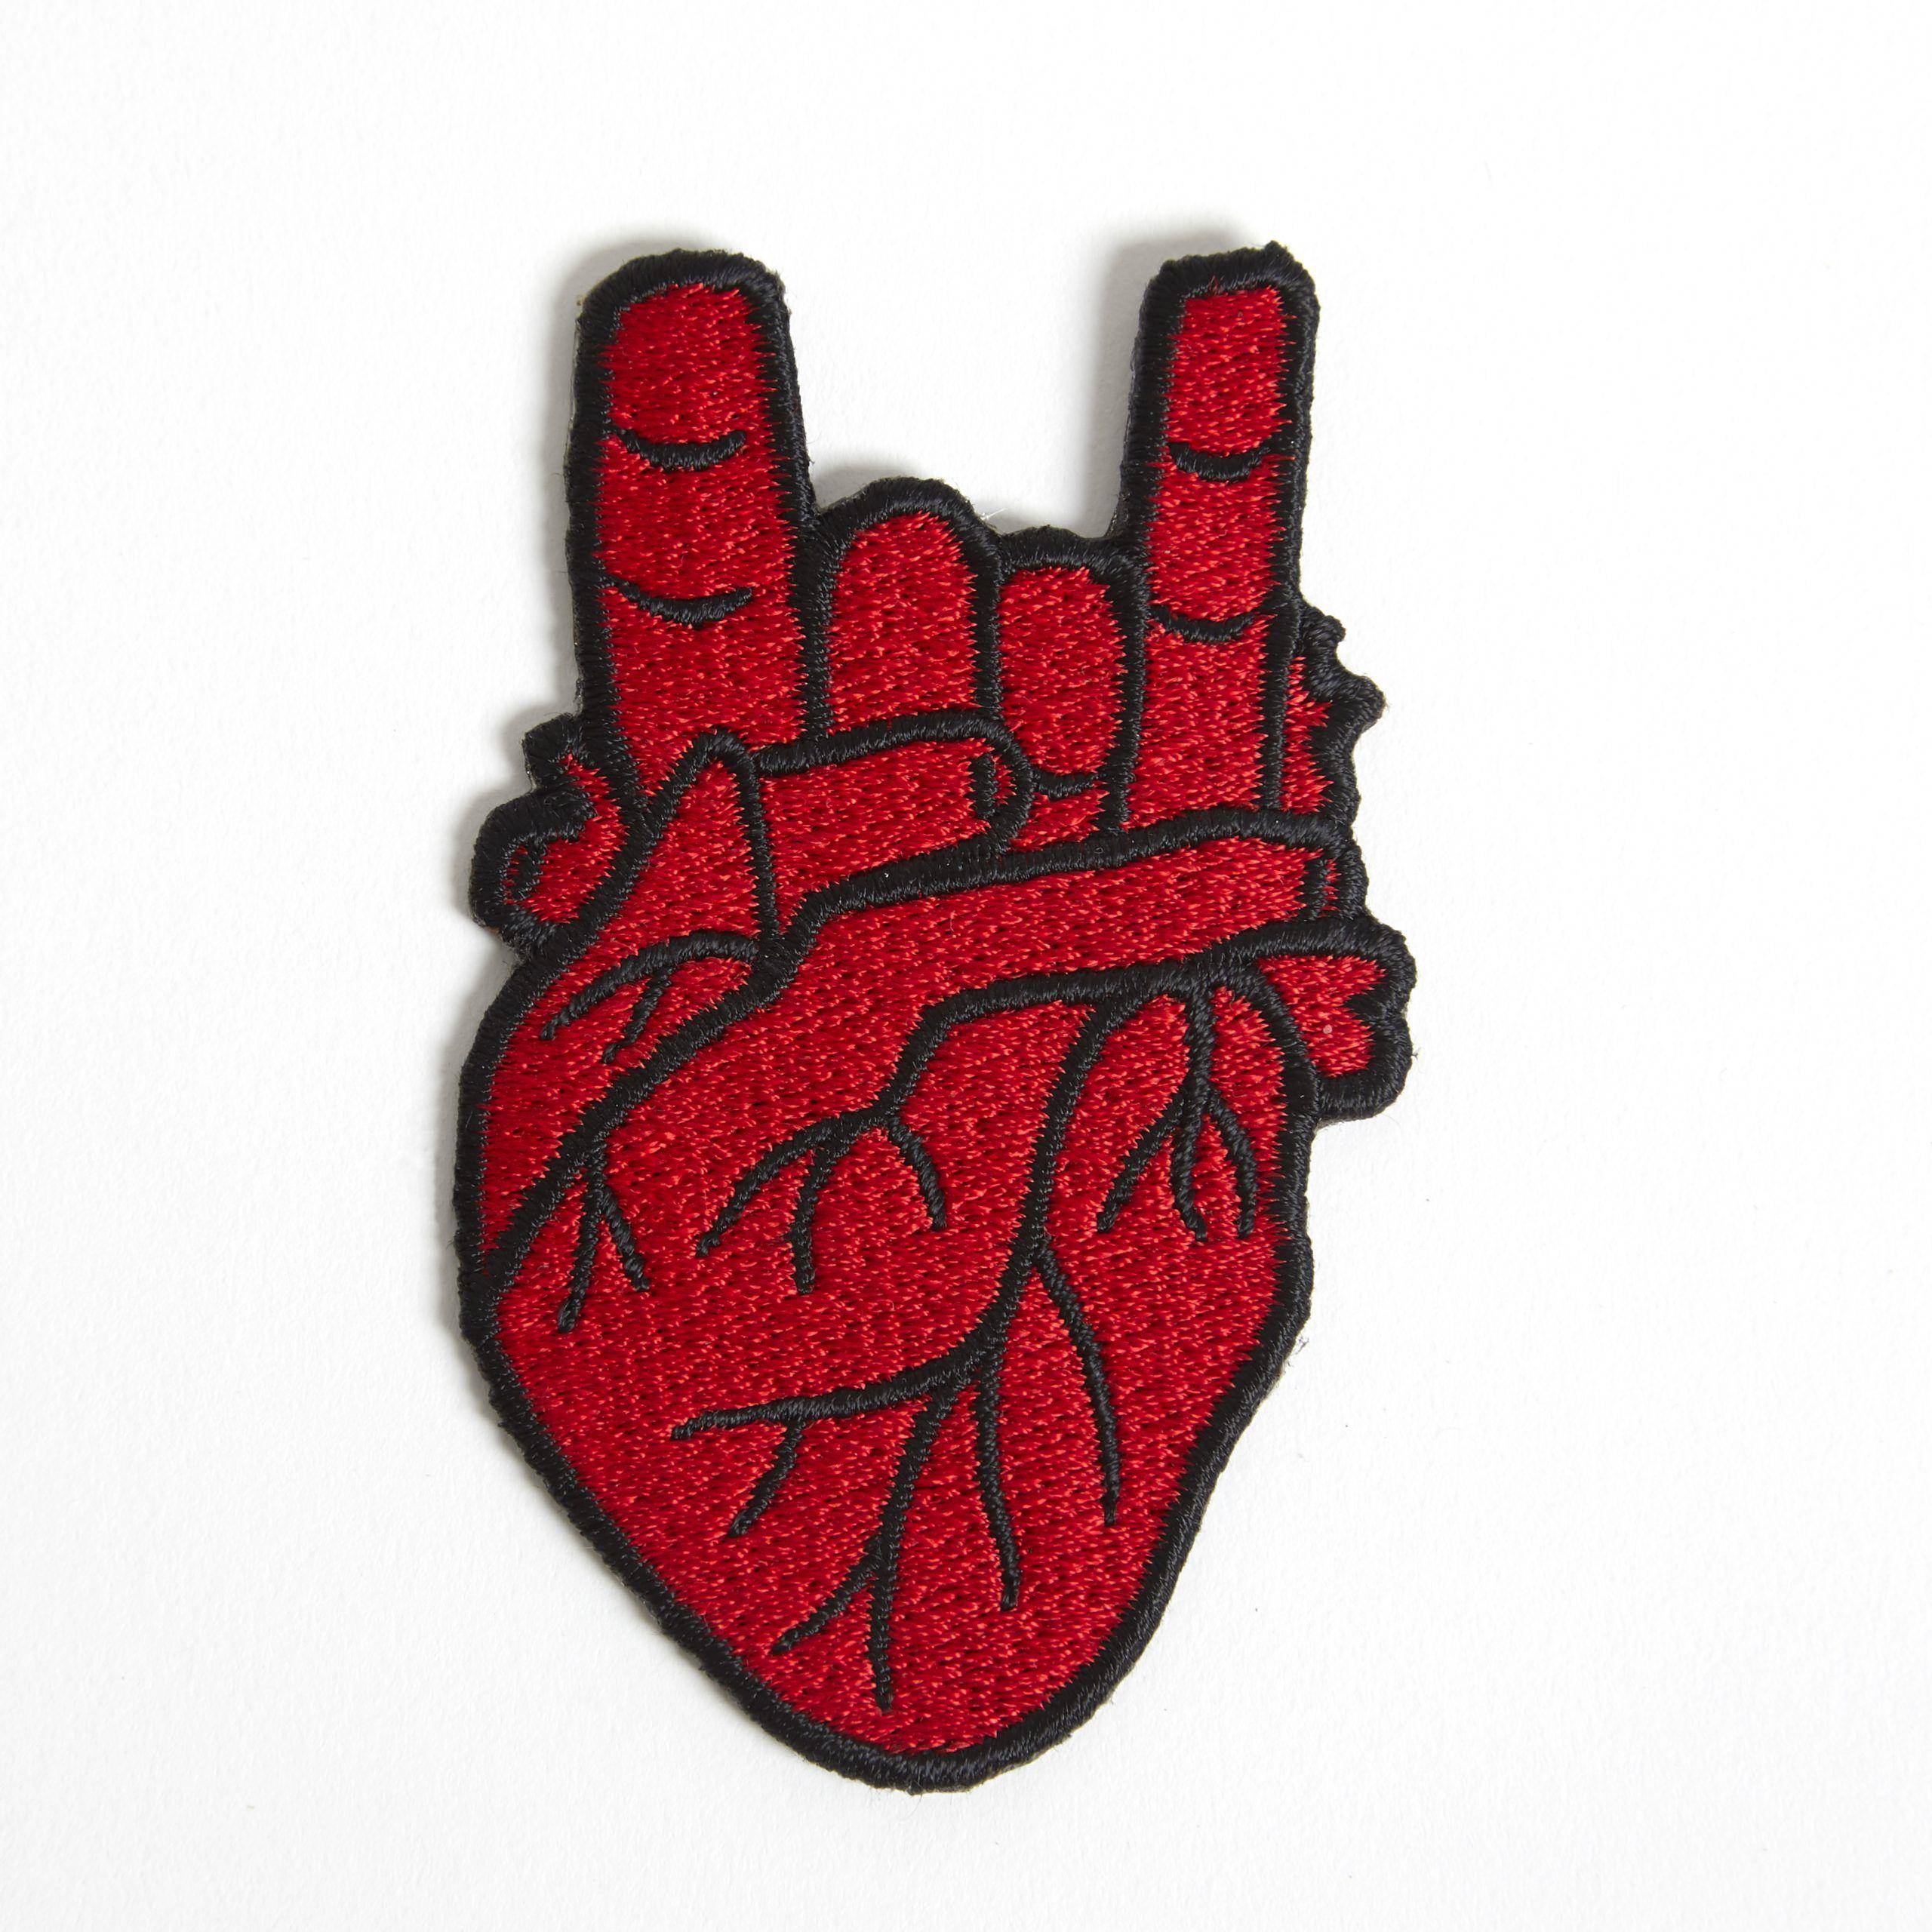 Parches Punk Rock Disenos Exclusivos Babies Maloik Parches Bordados Tatuajes De Rock Bordado